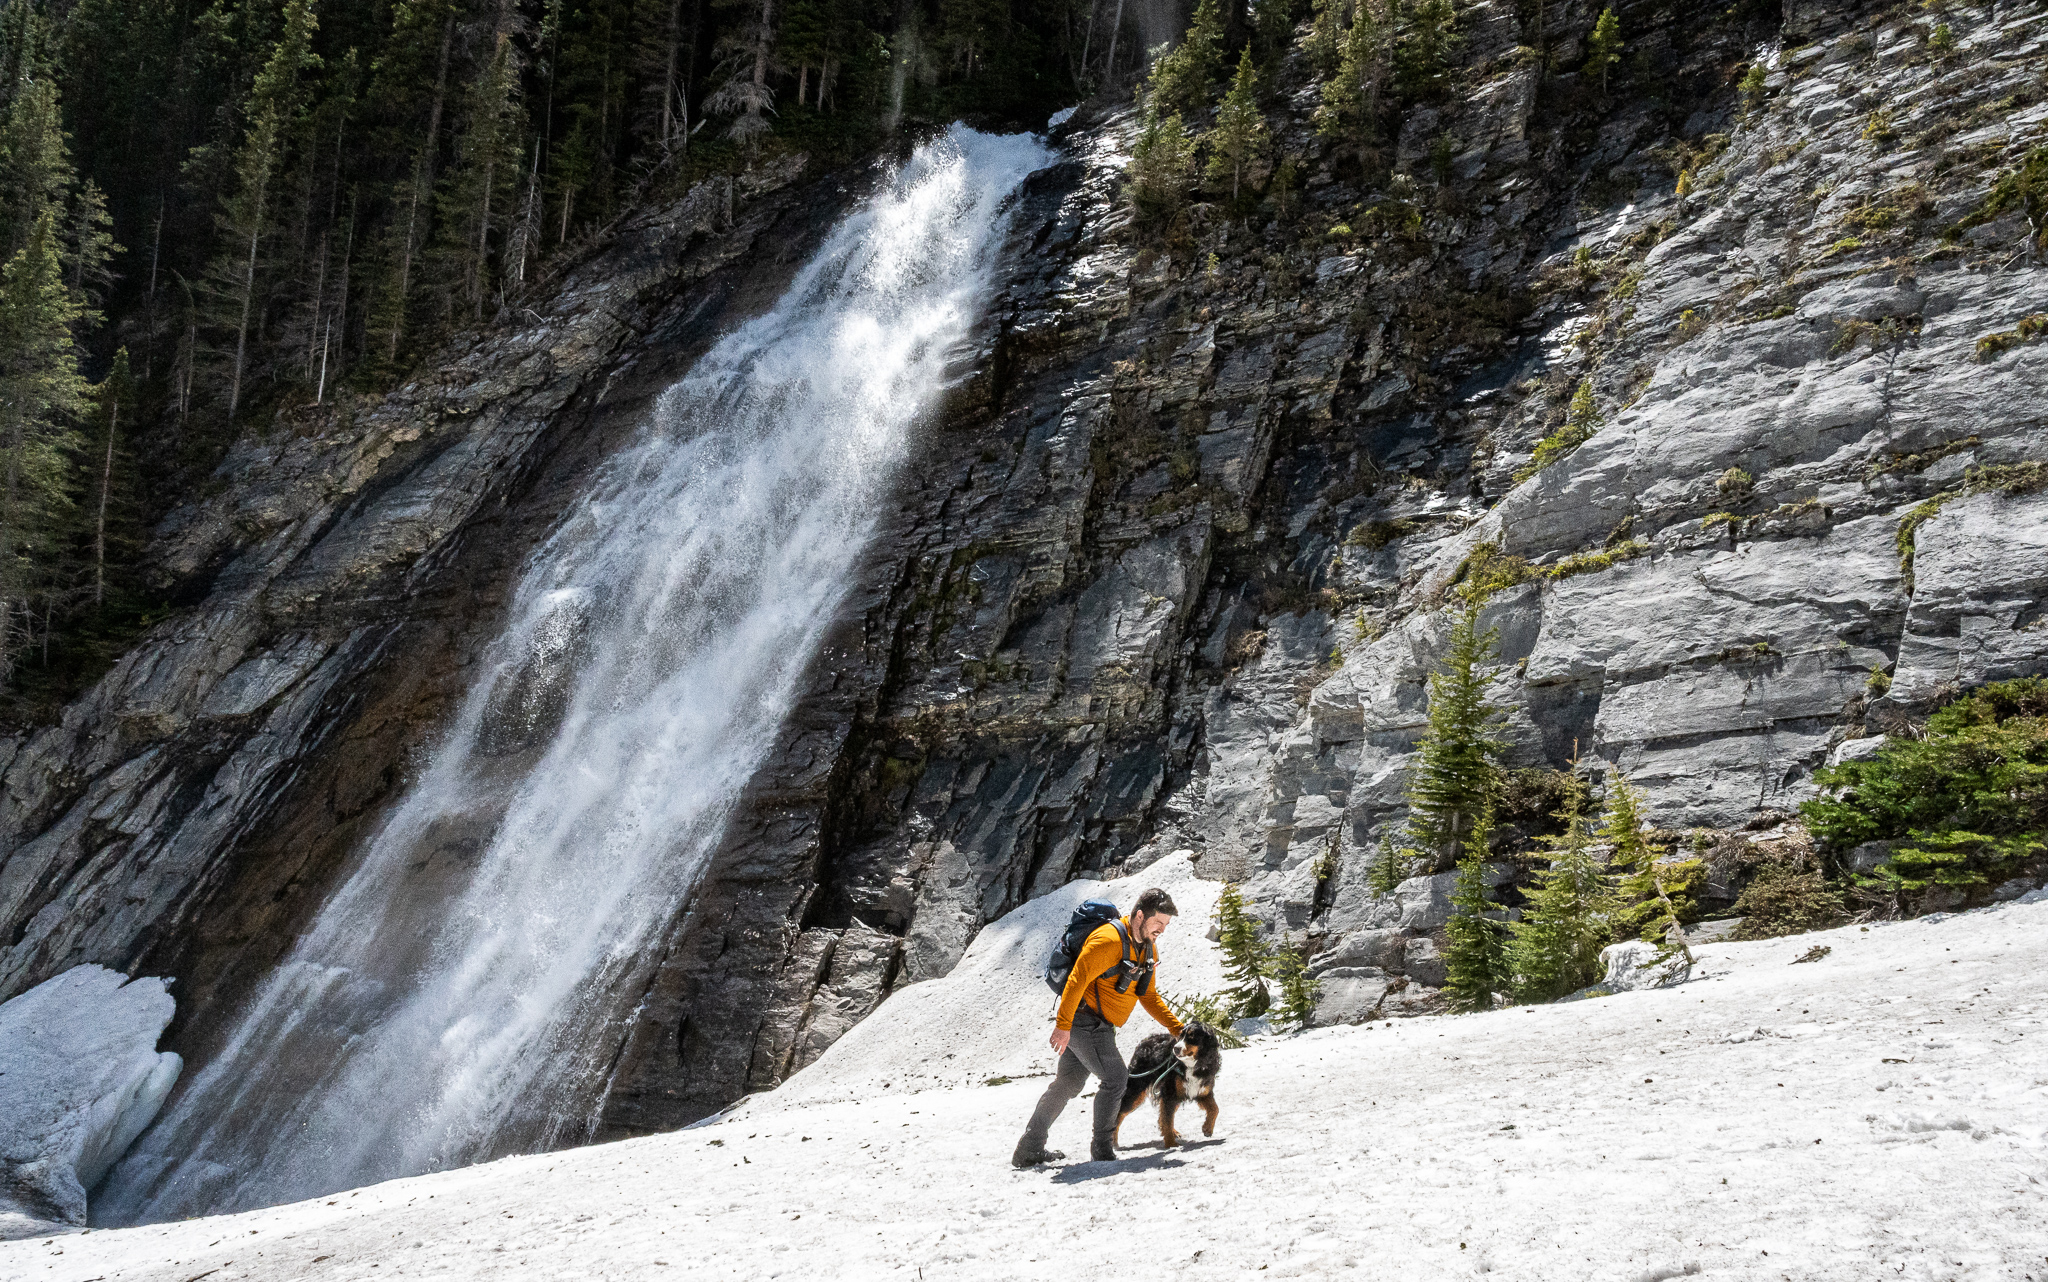 Ribbon Falls Hike in Kananaskis Country, Alberta via @outandacross